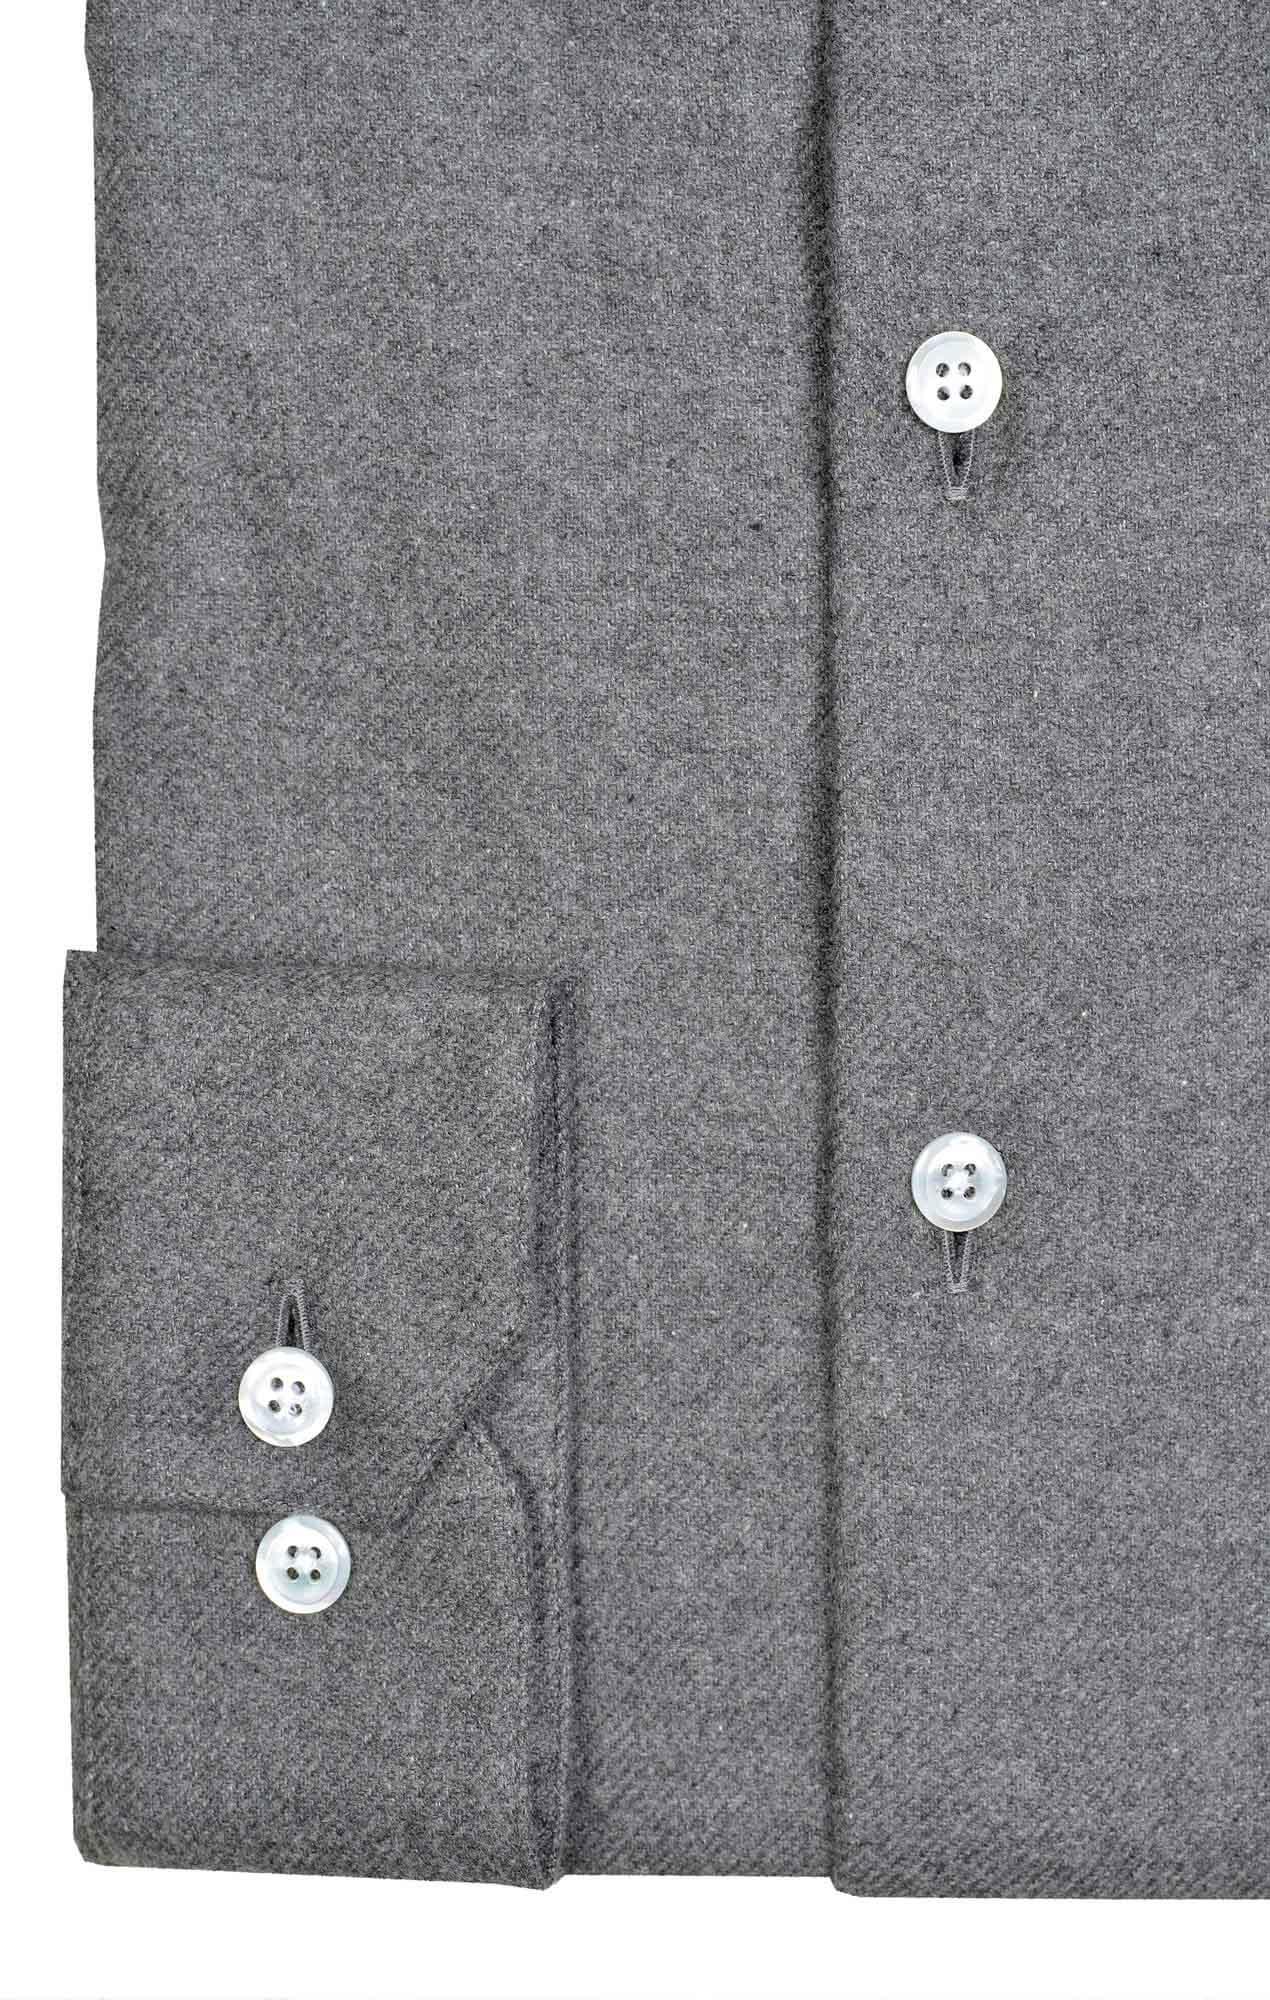 Chemise flanelle grise Chemises Hommes